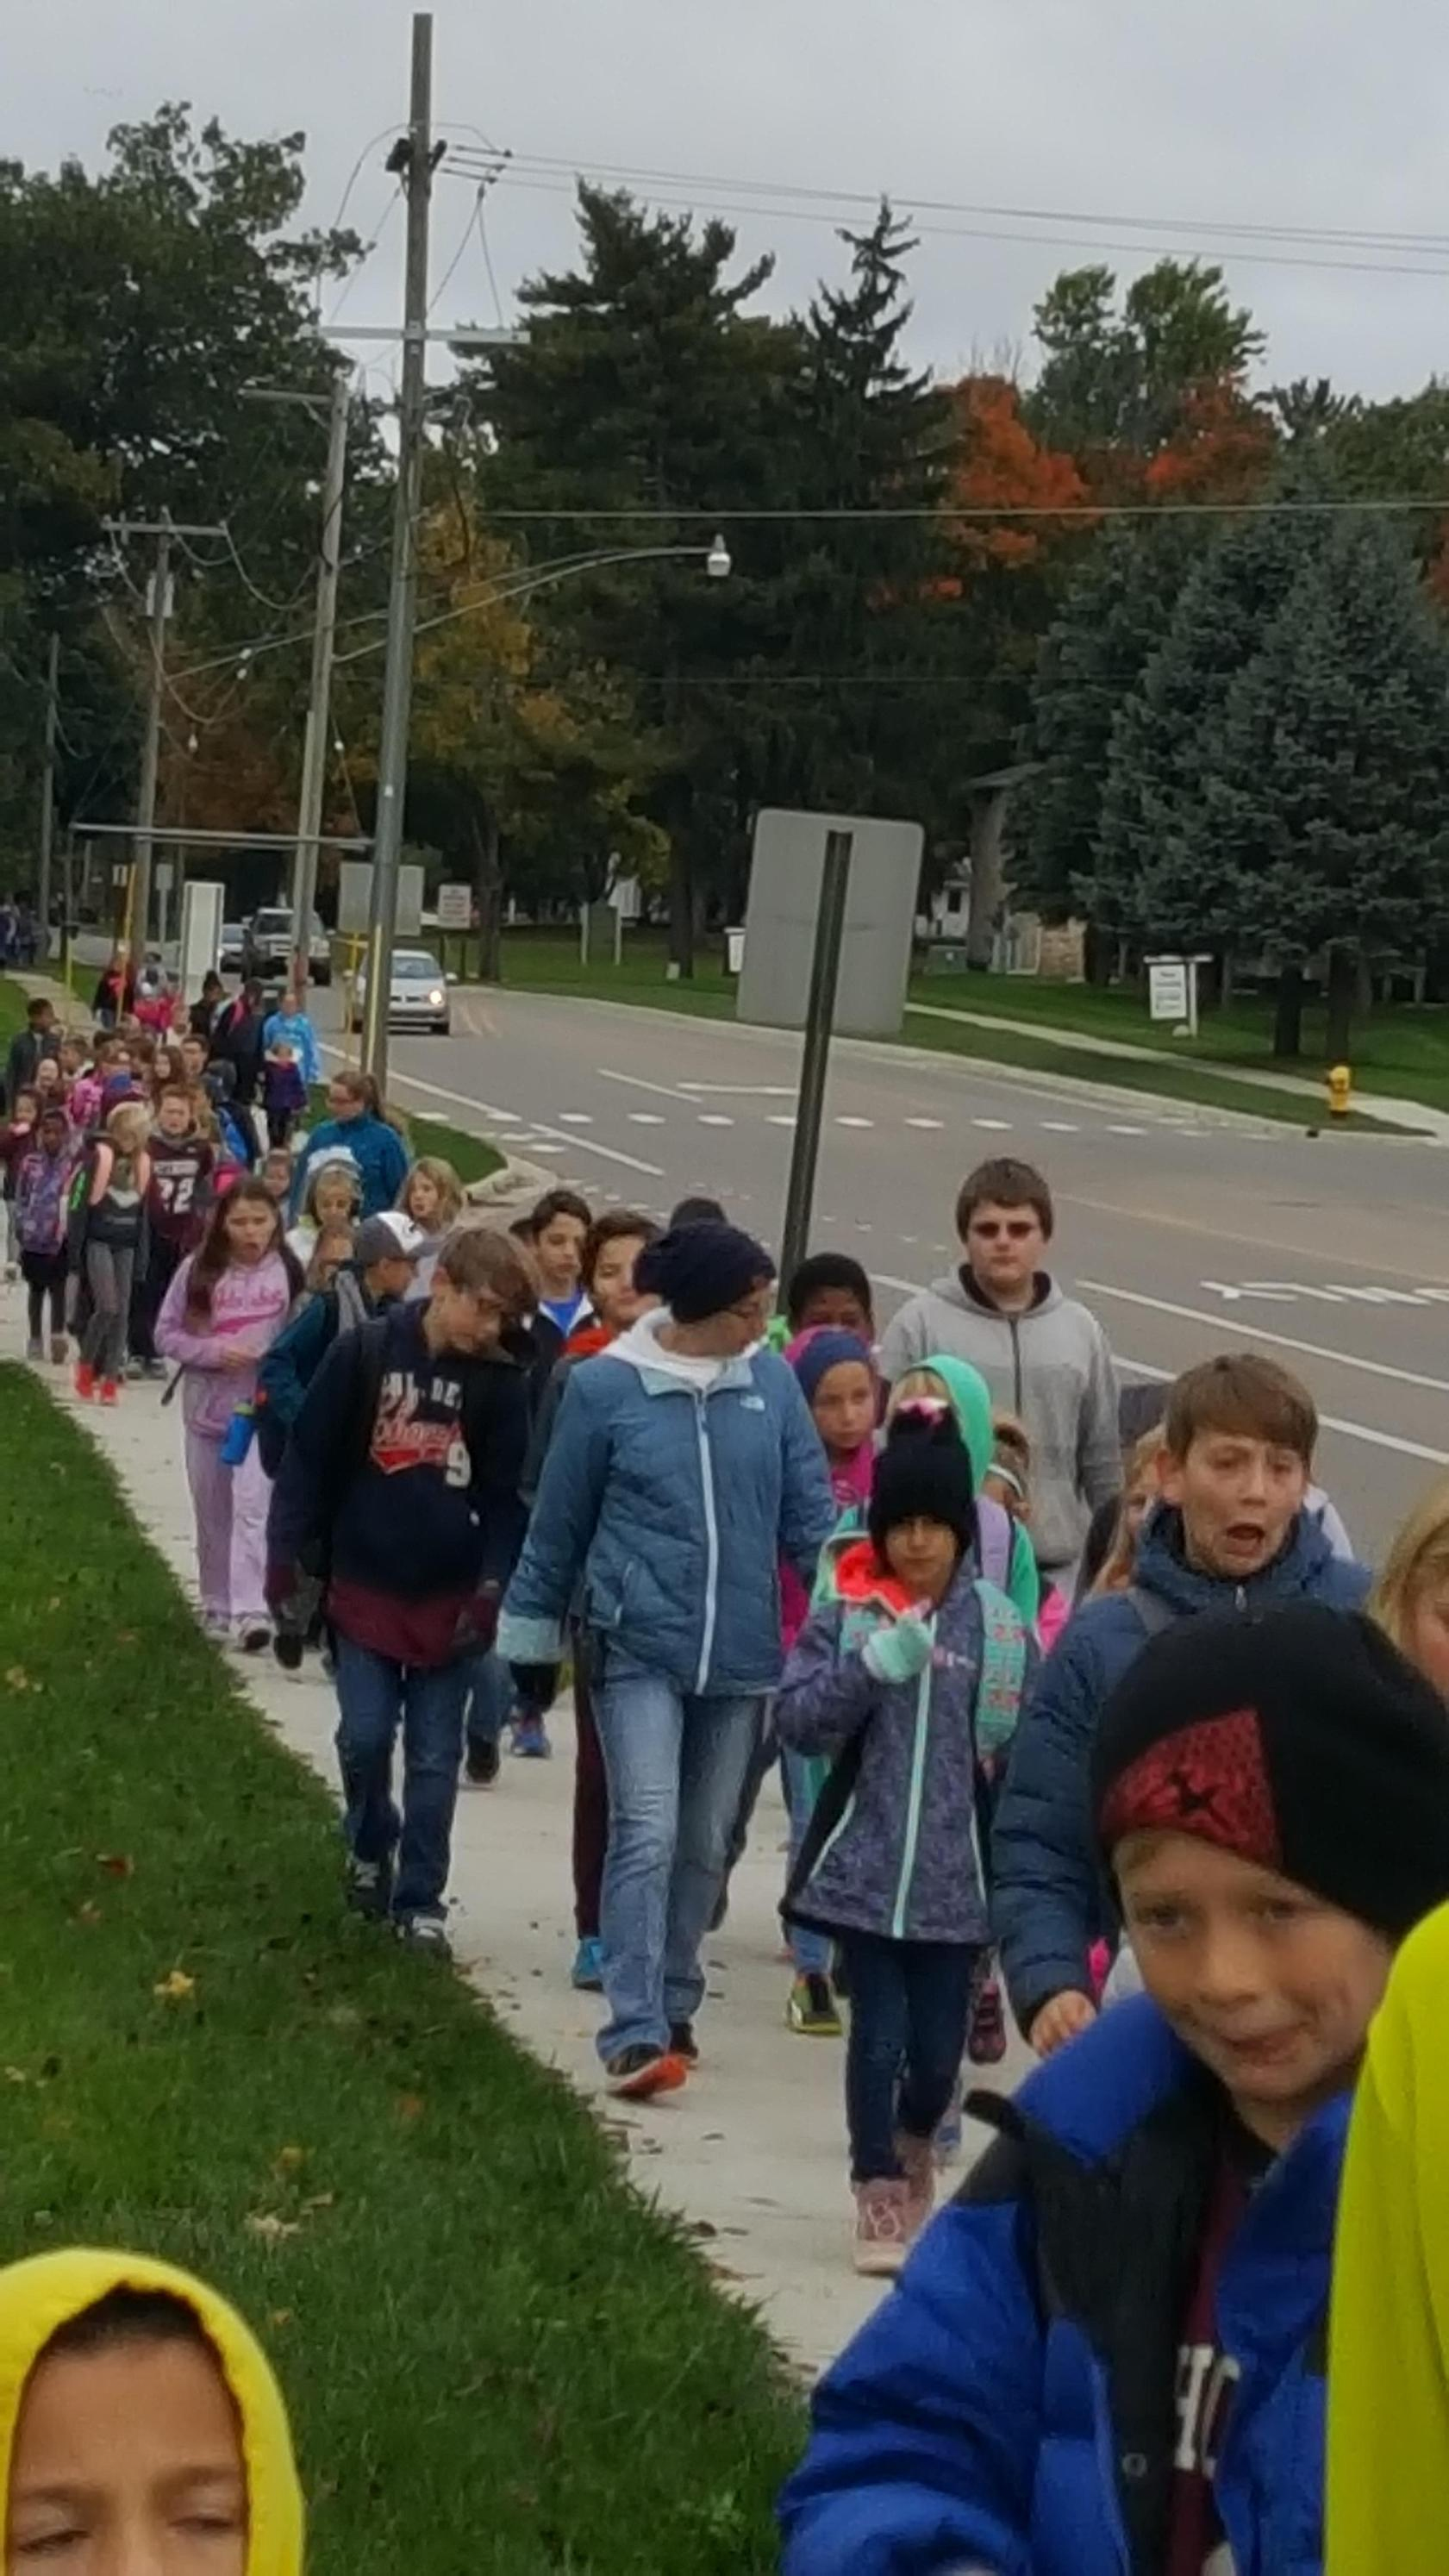 Photo of kids walking on walk to school day